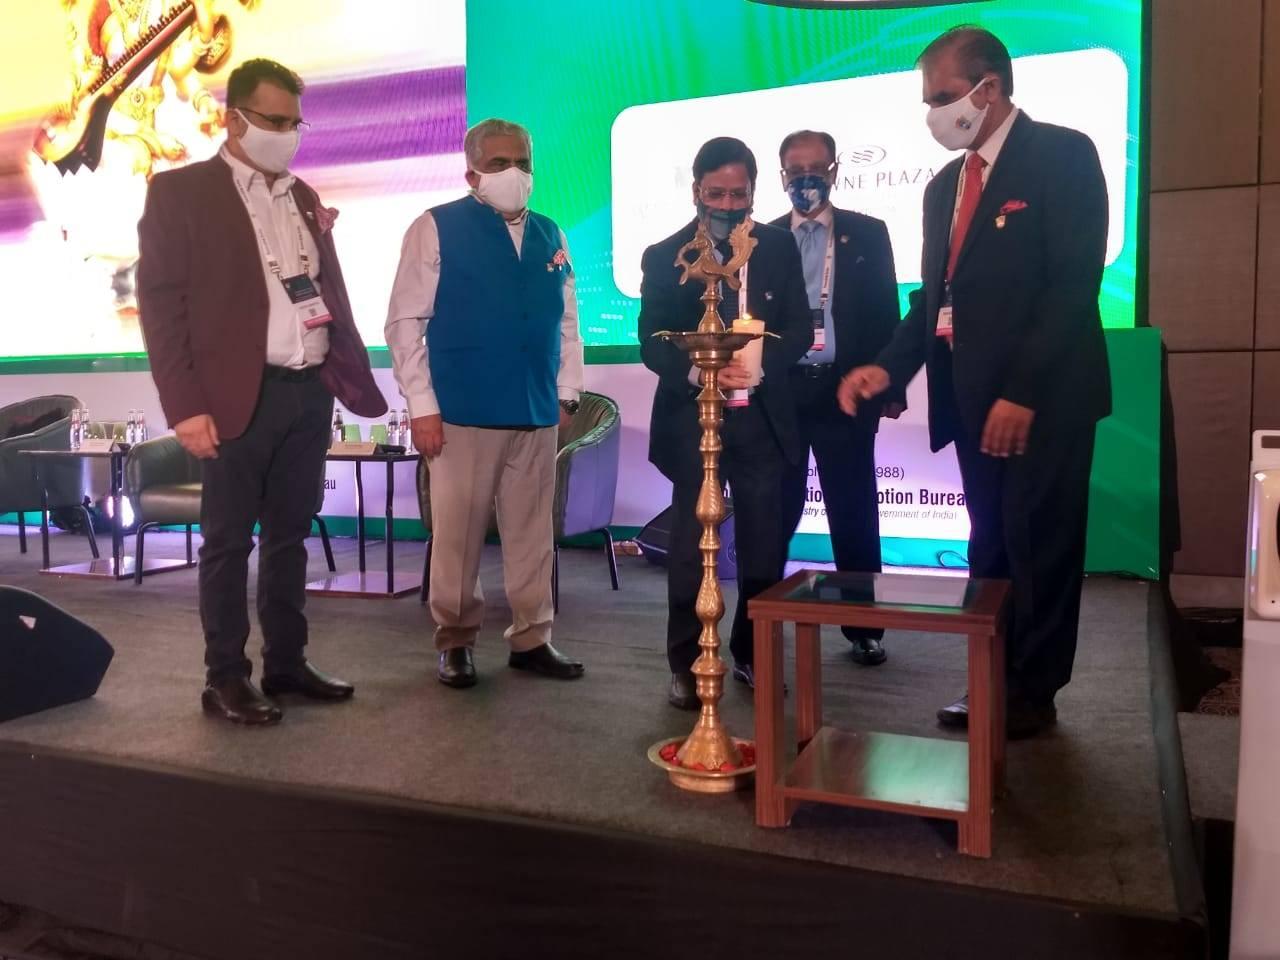 International MICE events help elevate the image of destinations: Prahlad Singh Patel